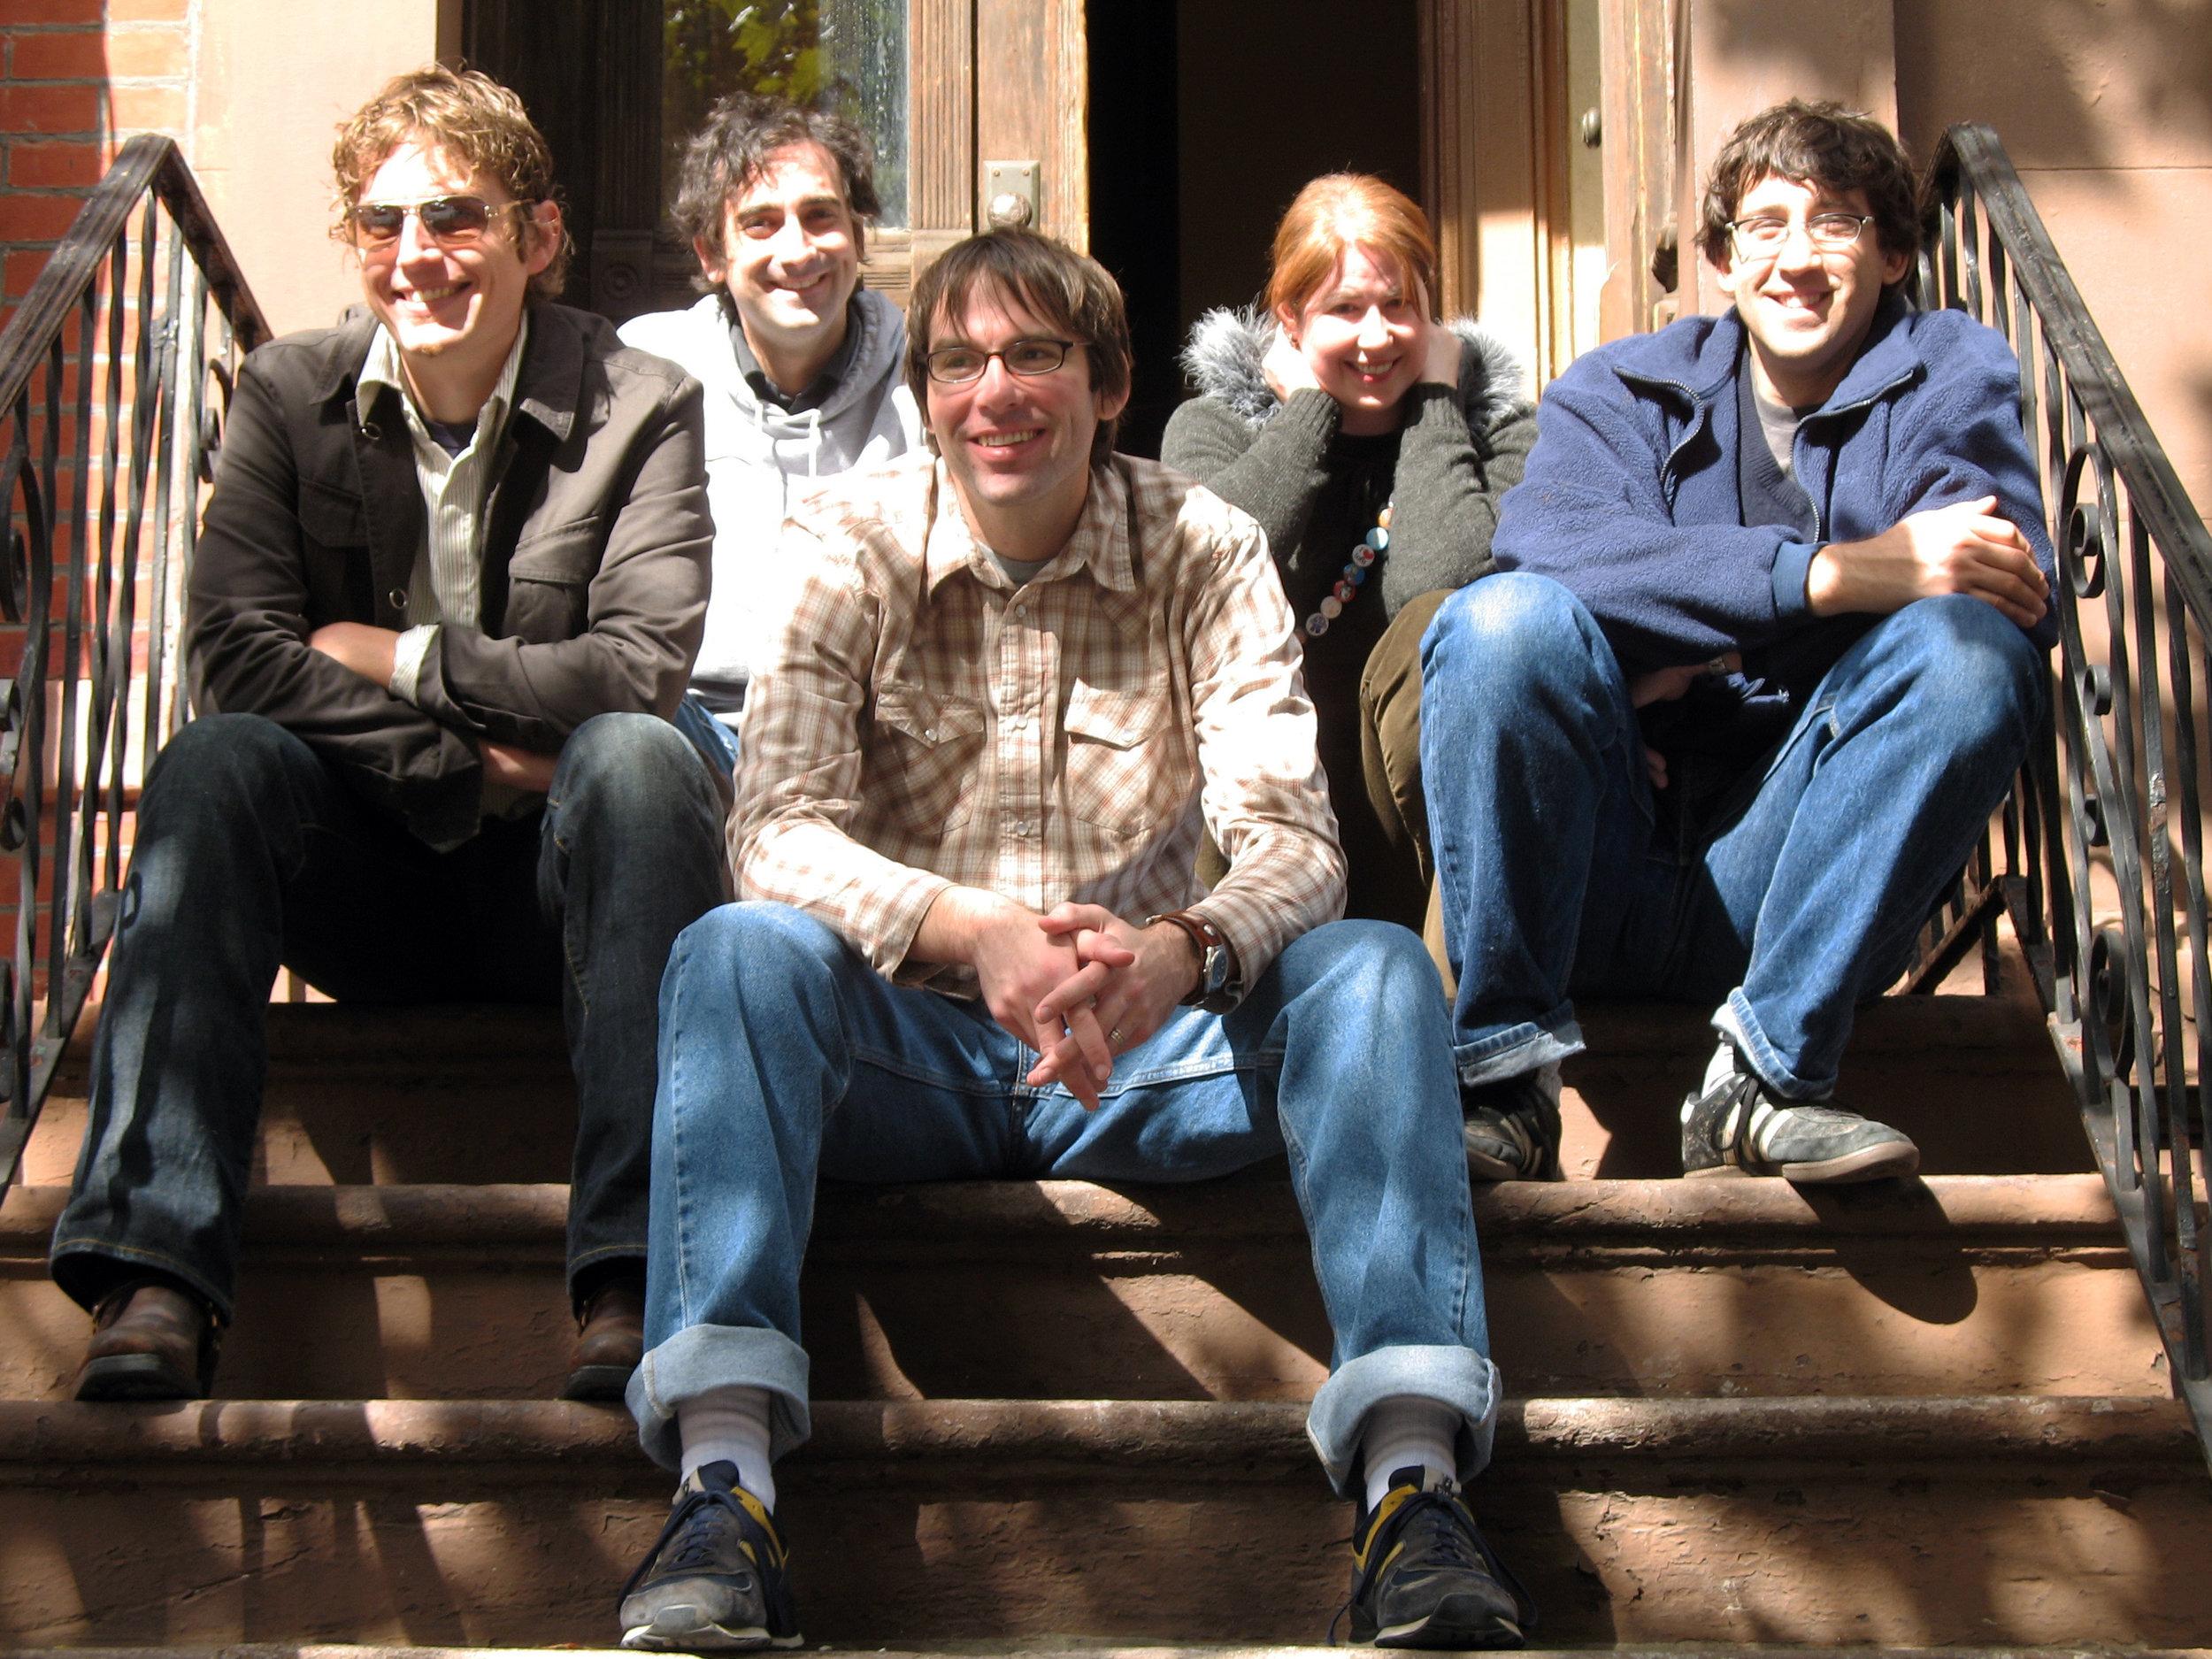 MAPC-Brooklyn-2006.JPG